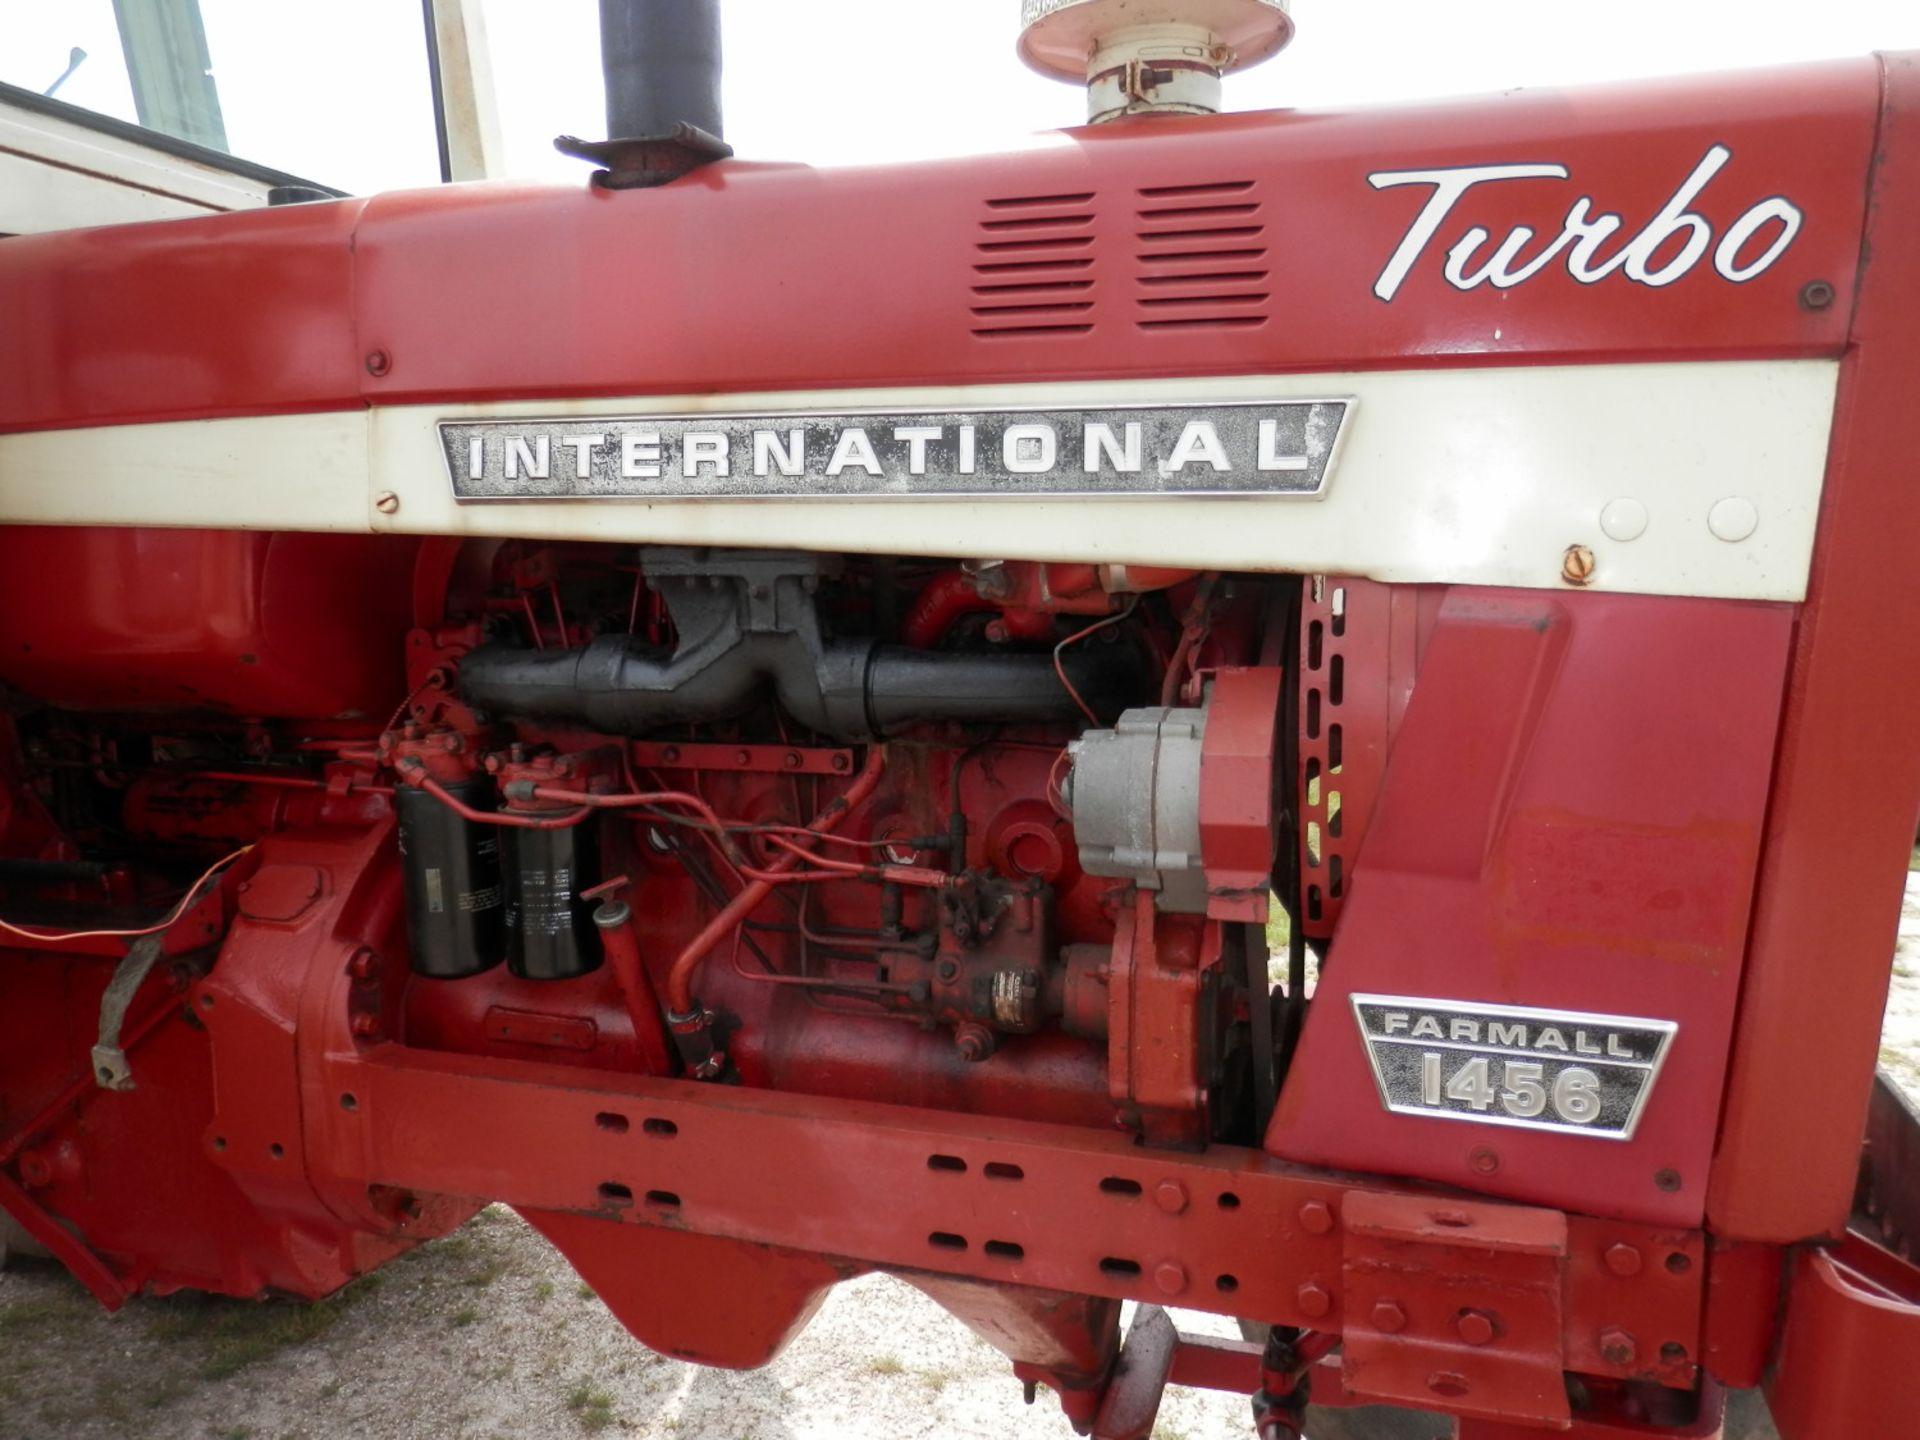 INTERNATIONAL 1456 TURBO TRACTOR - Image 6 of 8